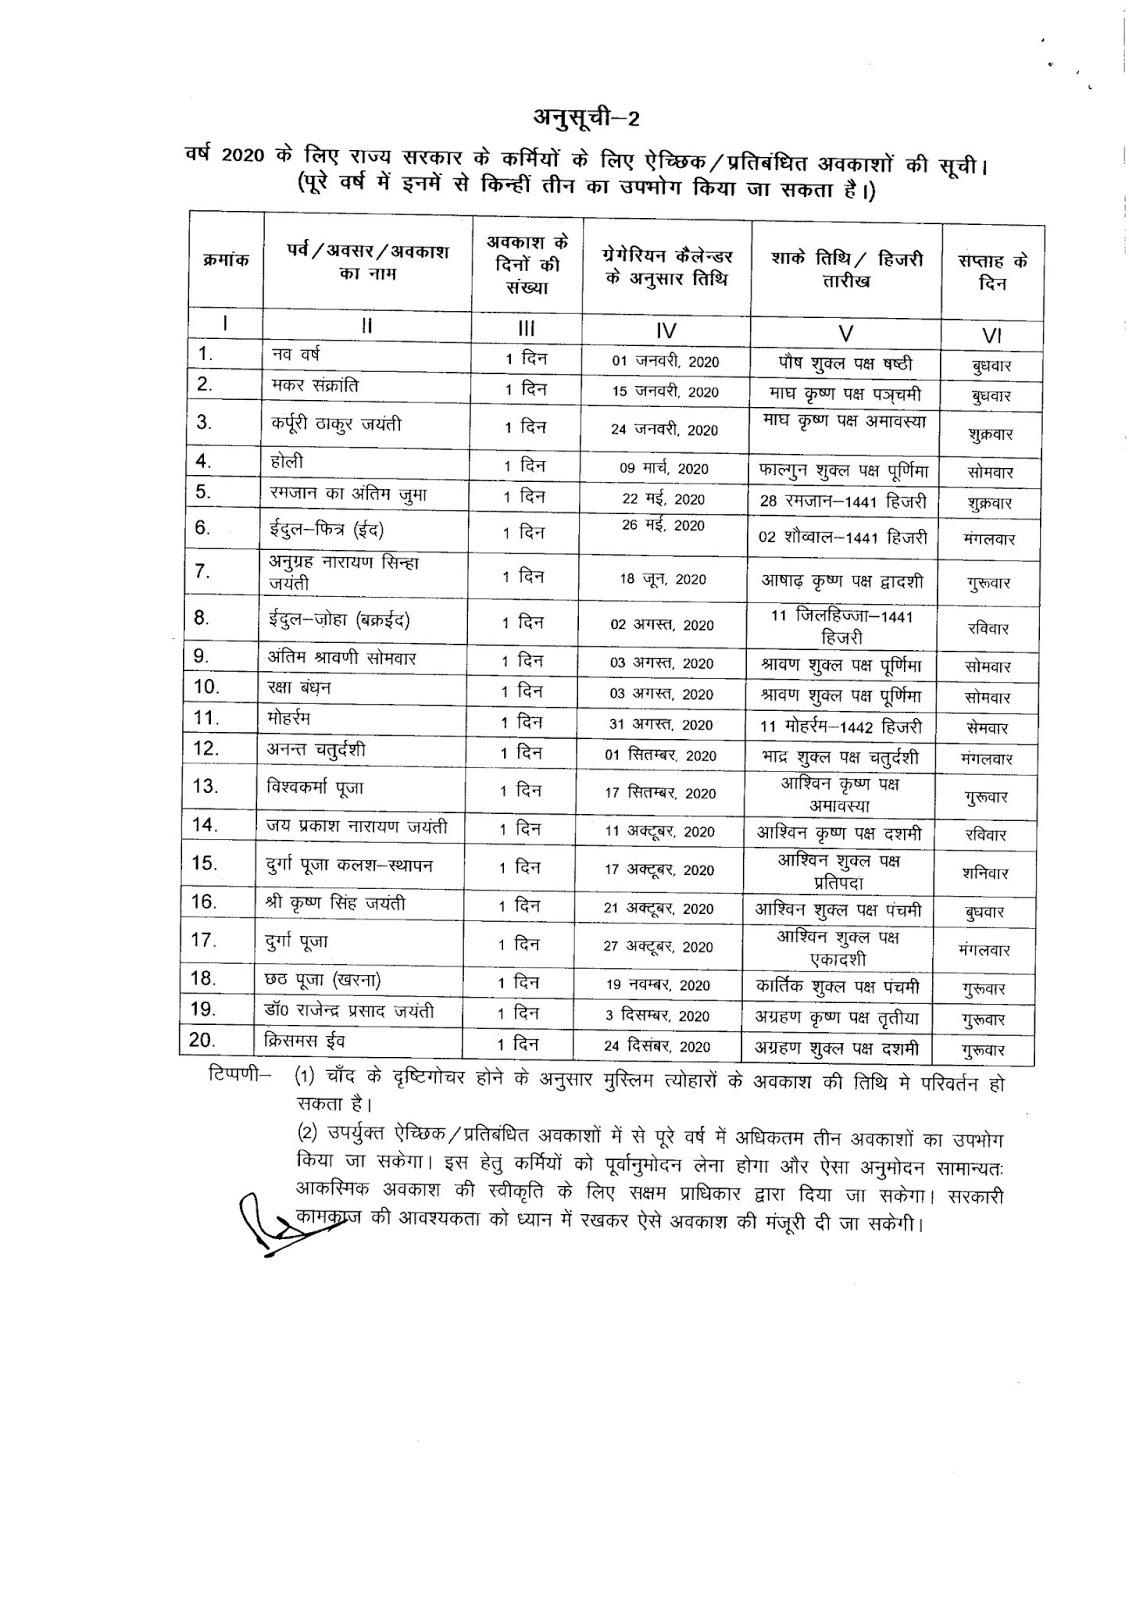 Bihar Government Calendar 2020 #educratsweb inside Bihar Sarkar Calendra